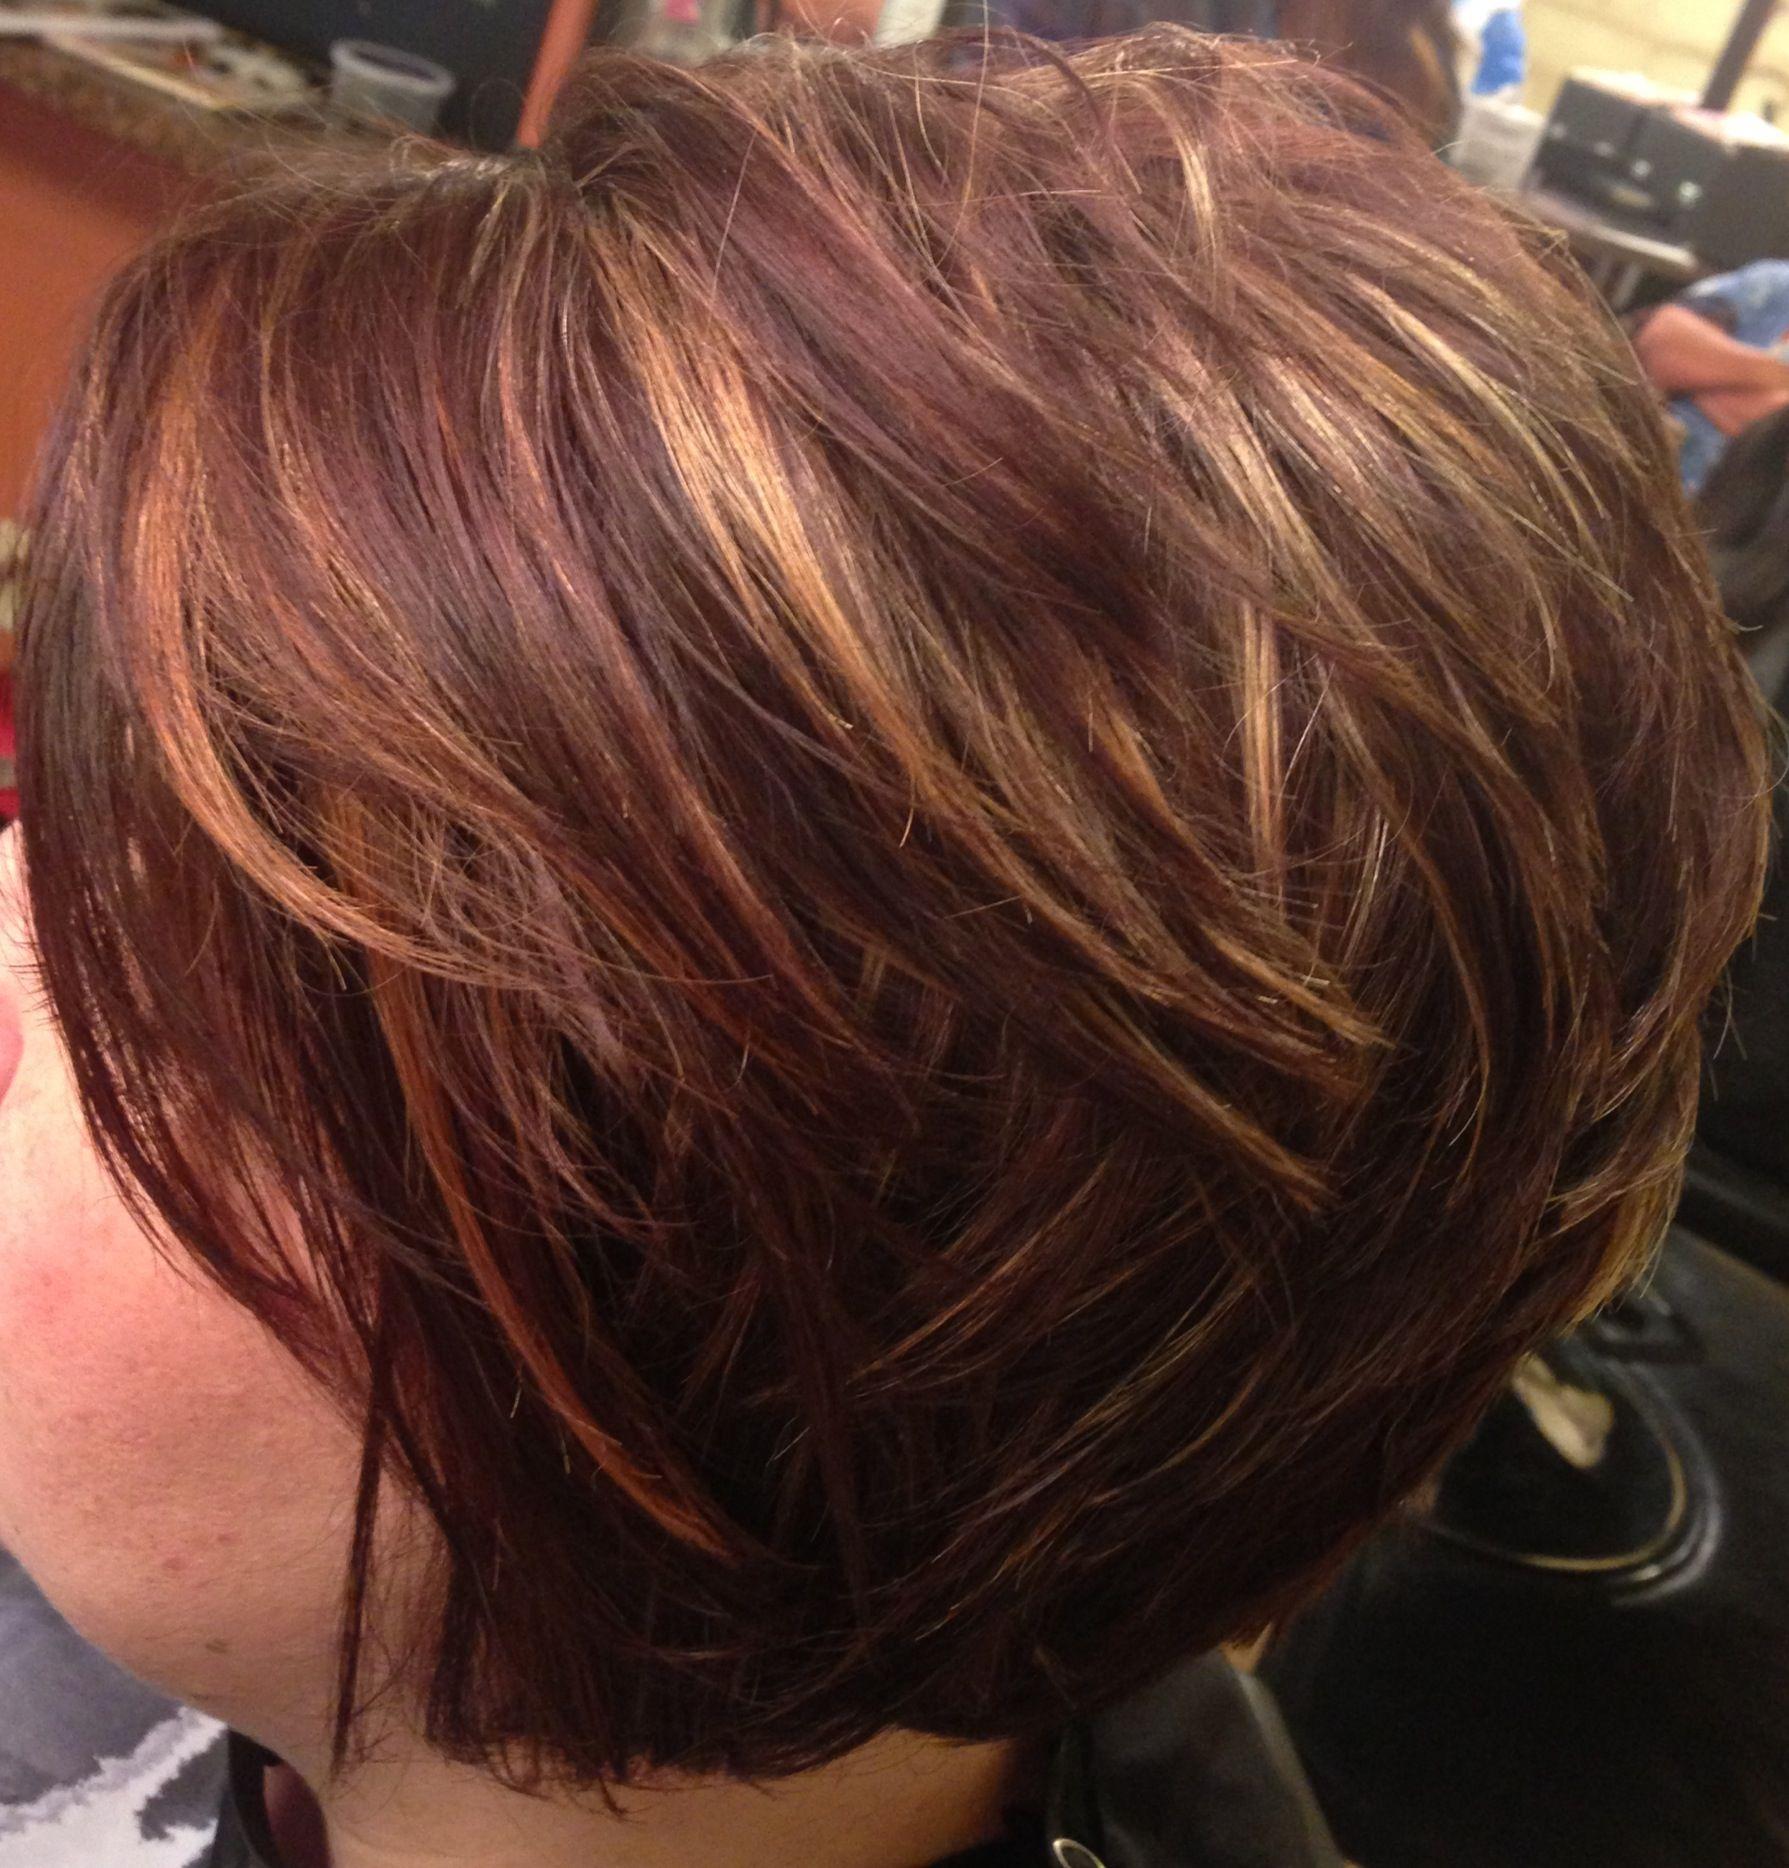 Asymmetrical, Inverted Bob, Caramel Highlights. Short Hair